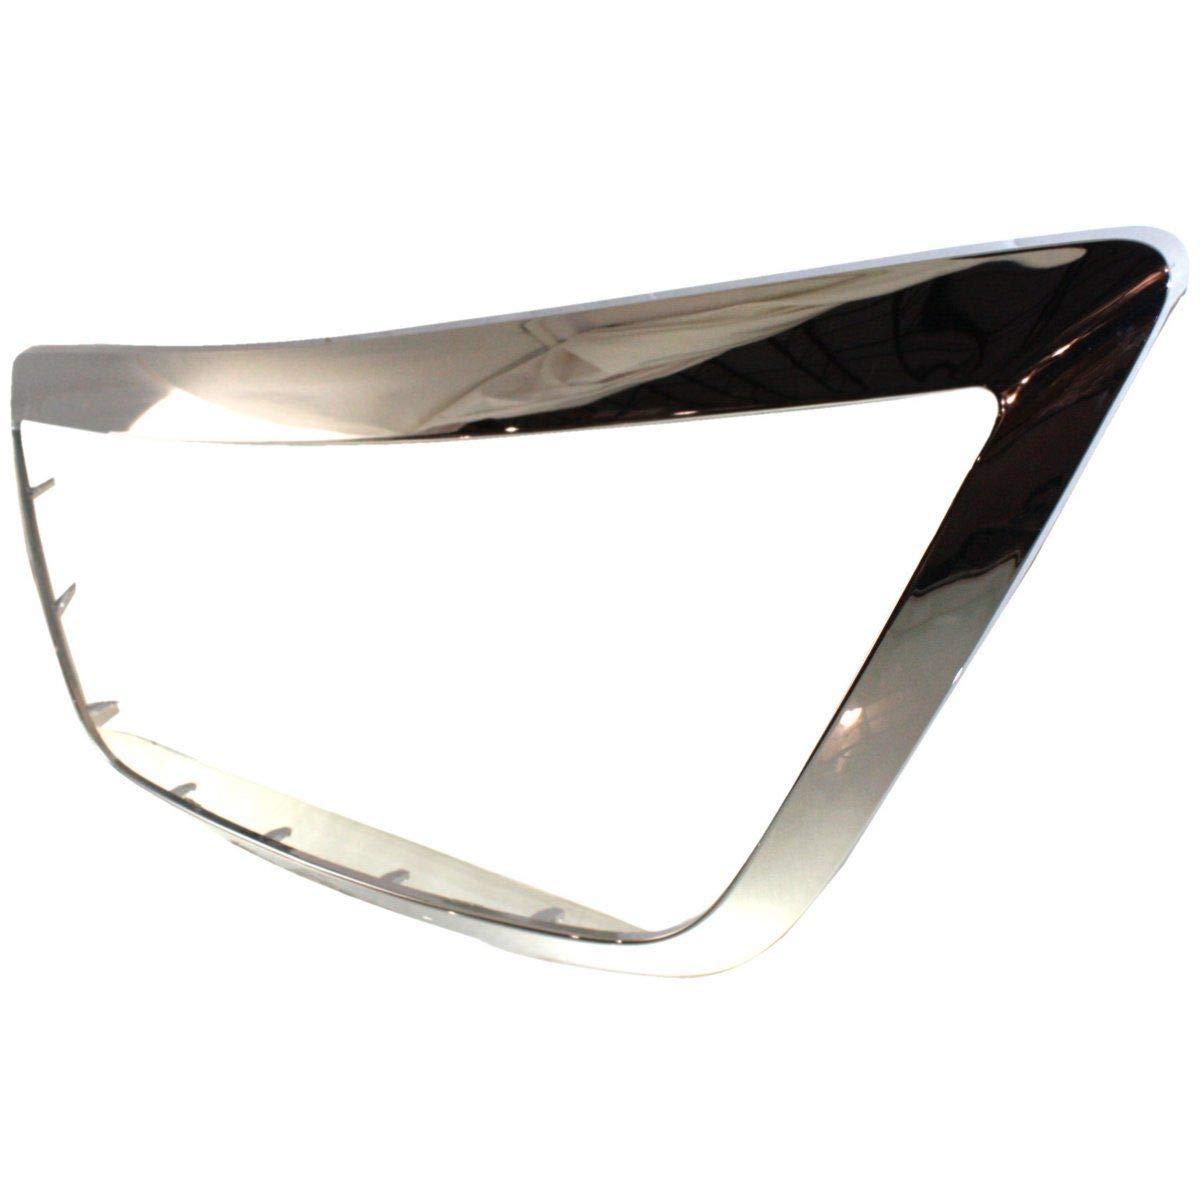 New Grille Trim Grill Chrome for Honda Odyssey 2005-2007 HO1202103 71122SHJA01